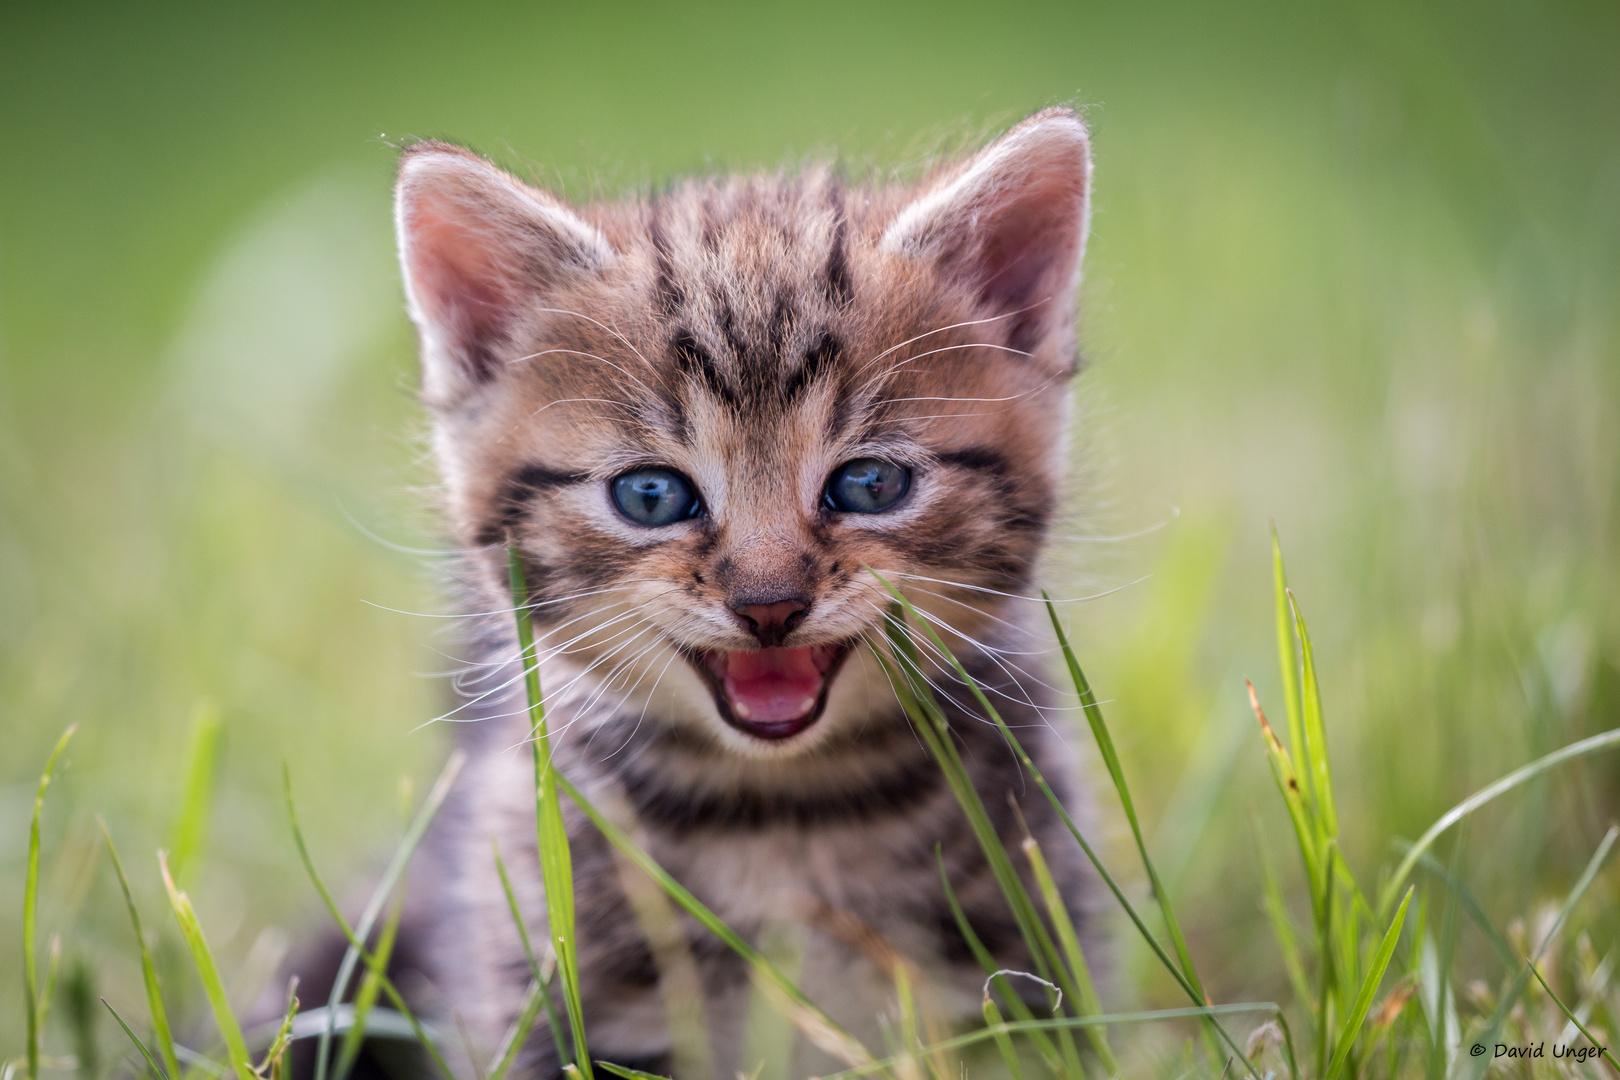 Babykatze Foto & Bild | gras, natur, katze Bilder auf